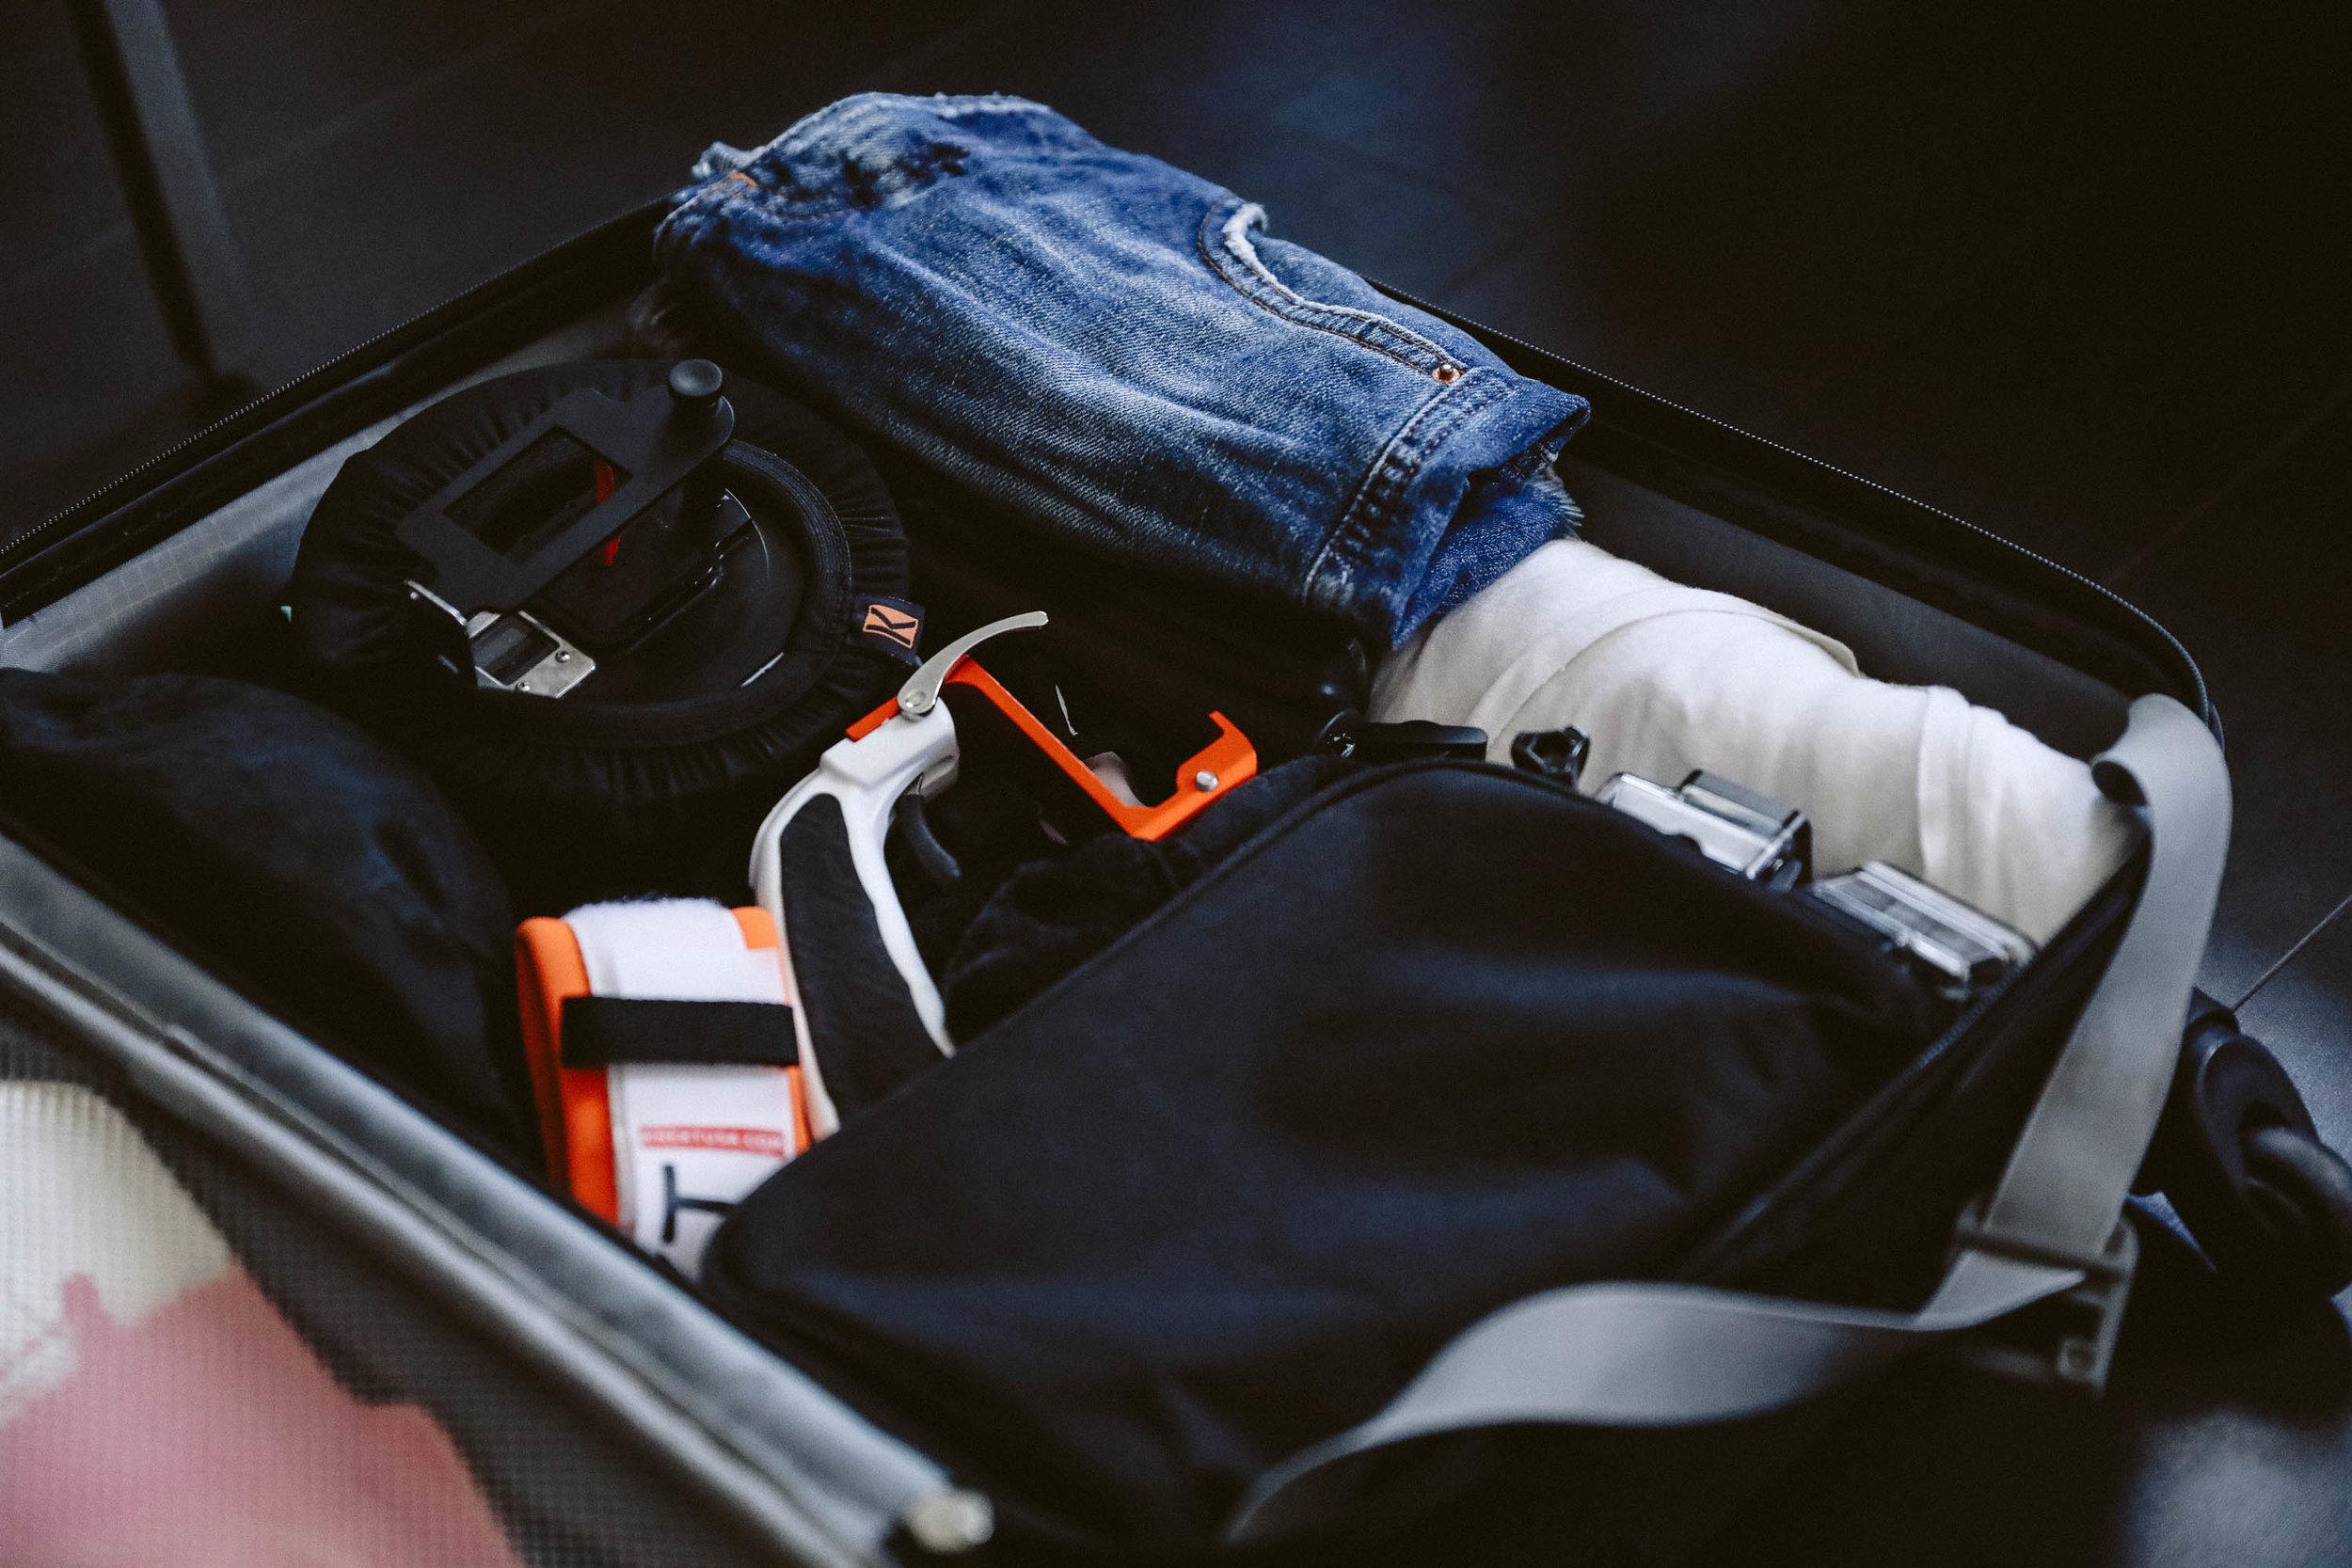 082317-CarryOn-TravelTrips-8.jpg